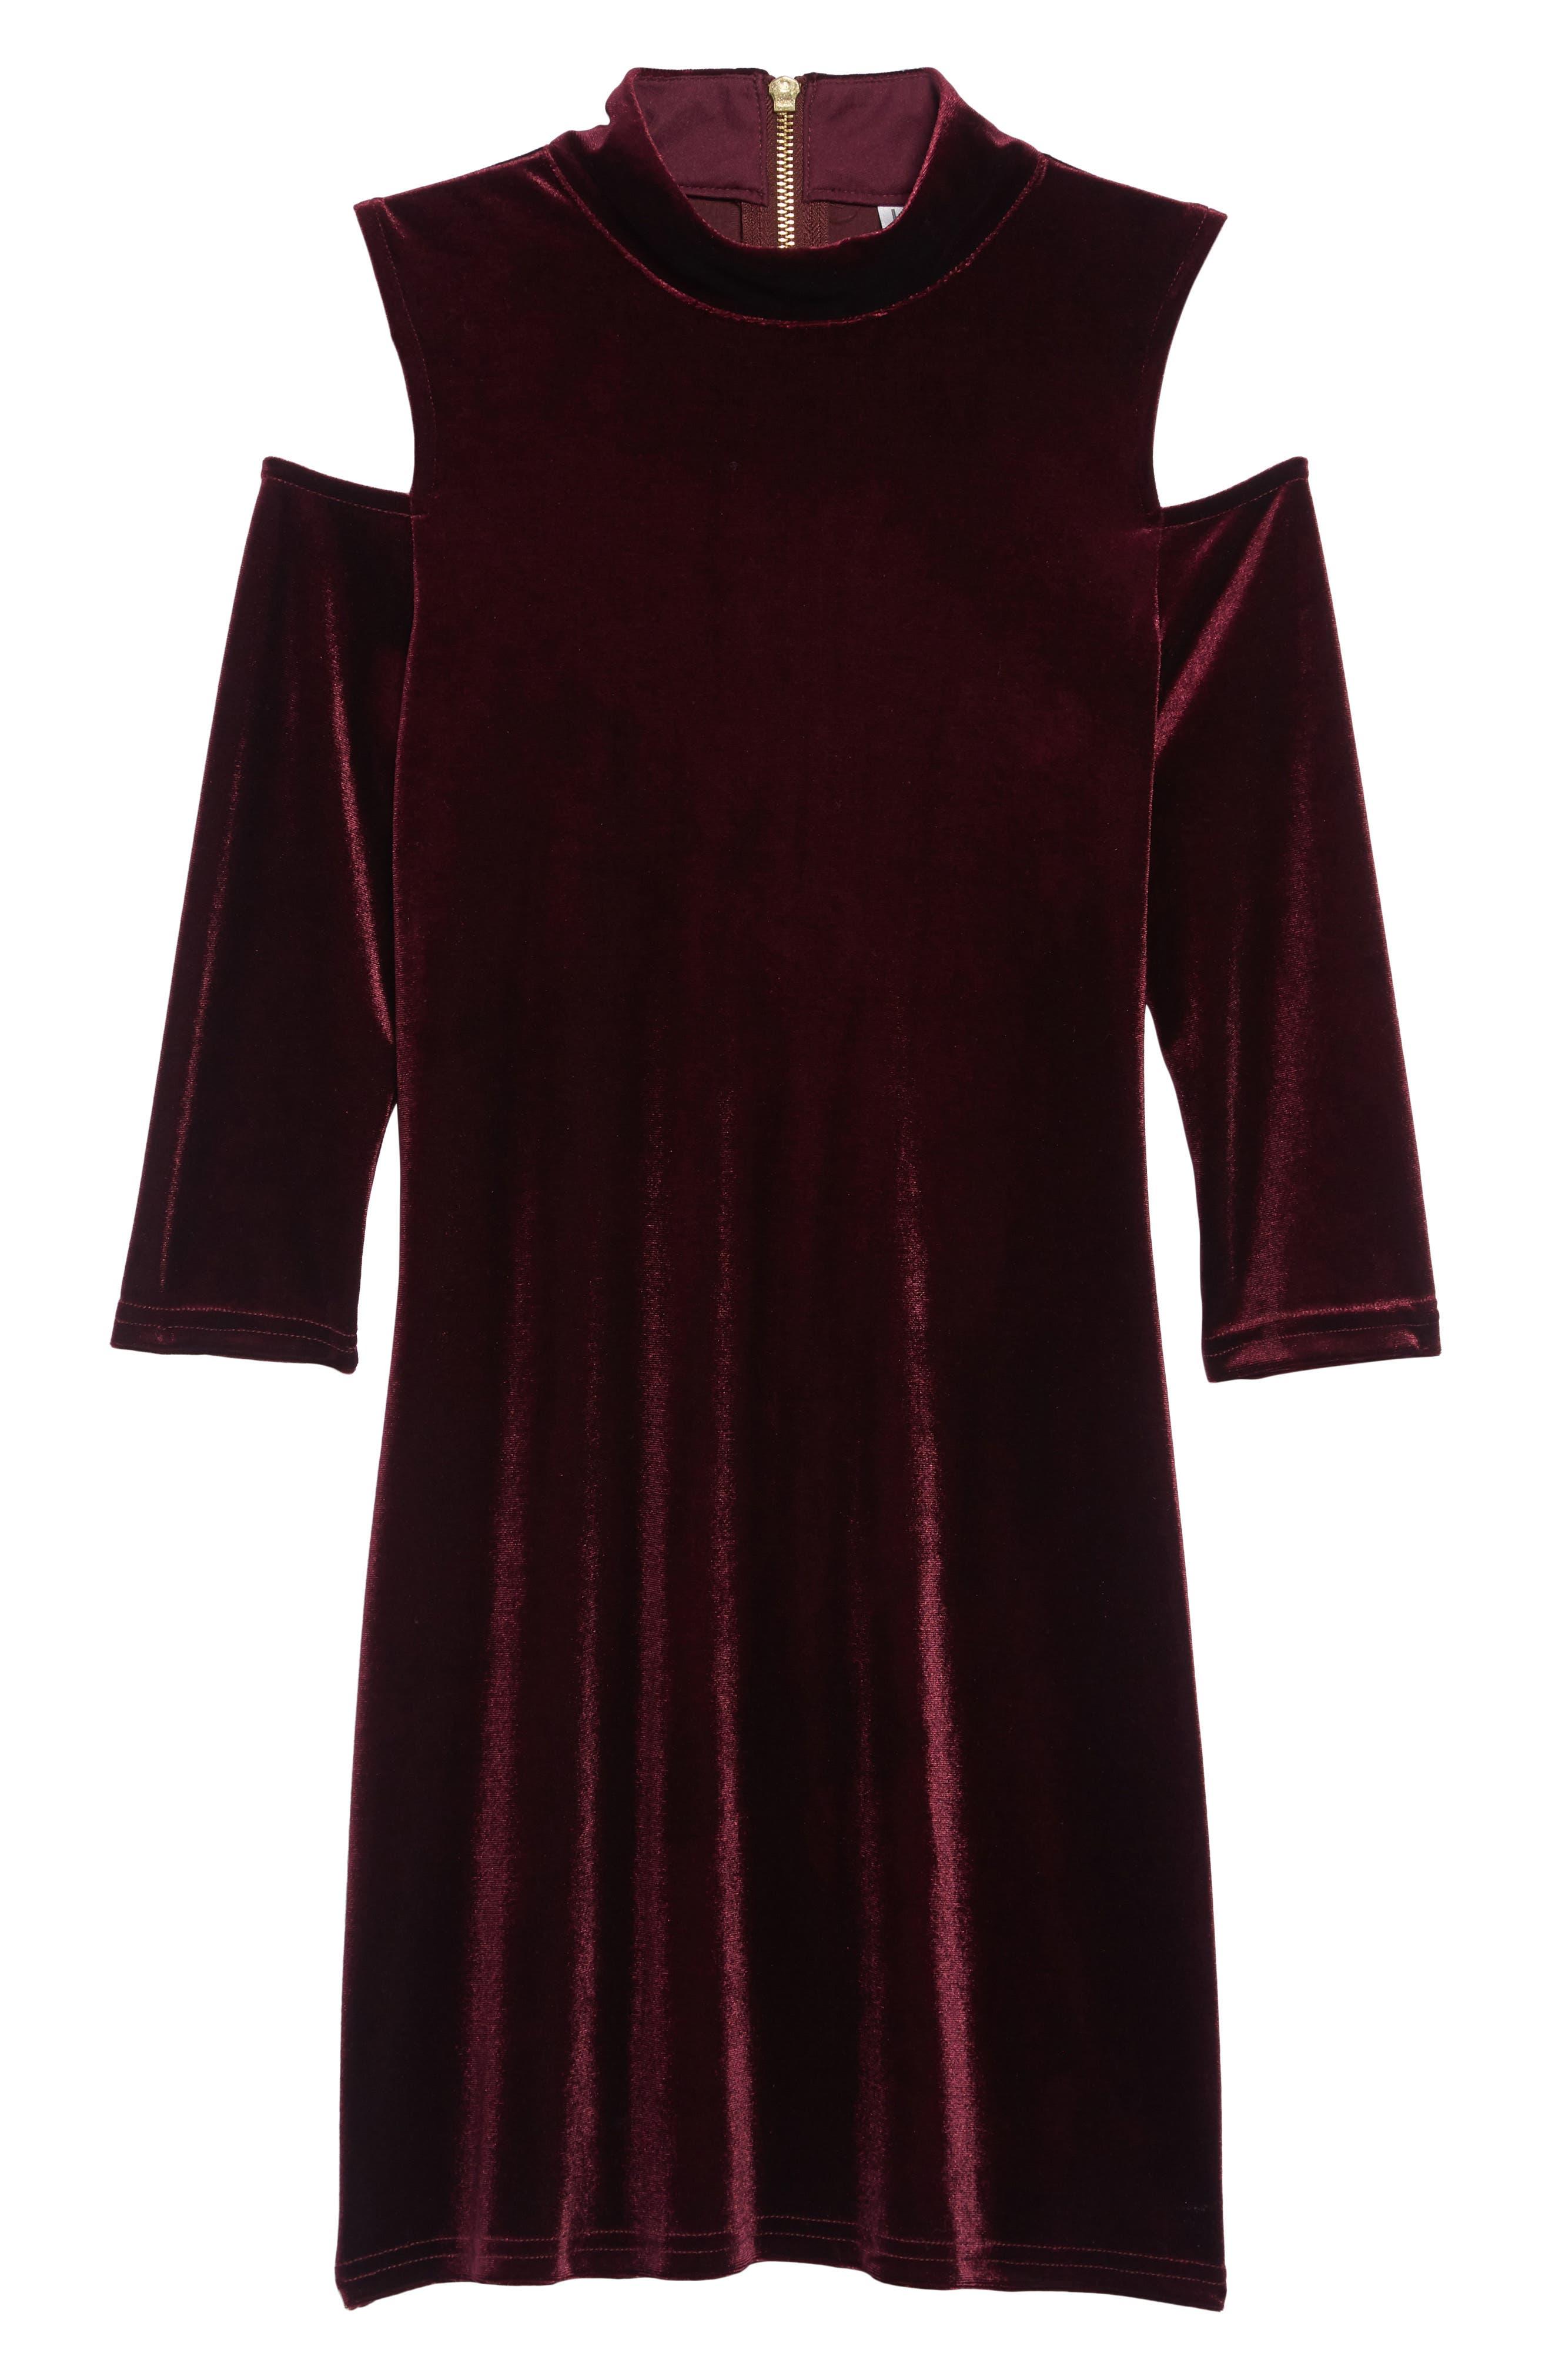 BLUSH BY US ANGELS, Cold Shoulder Velvet Dress, Main thumbnail 1, color, BERRY